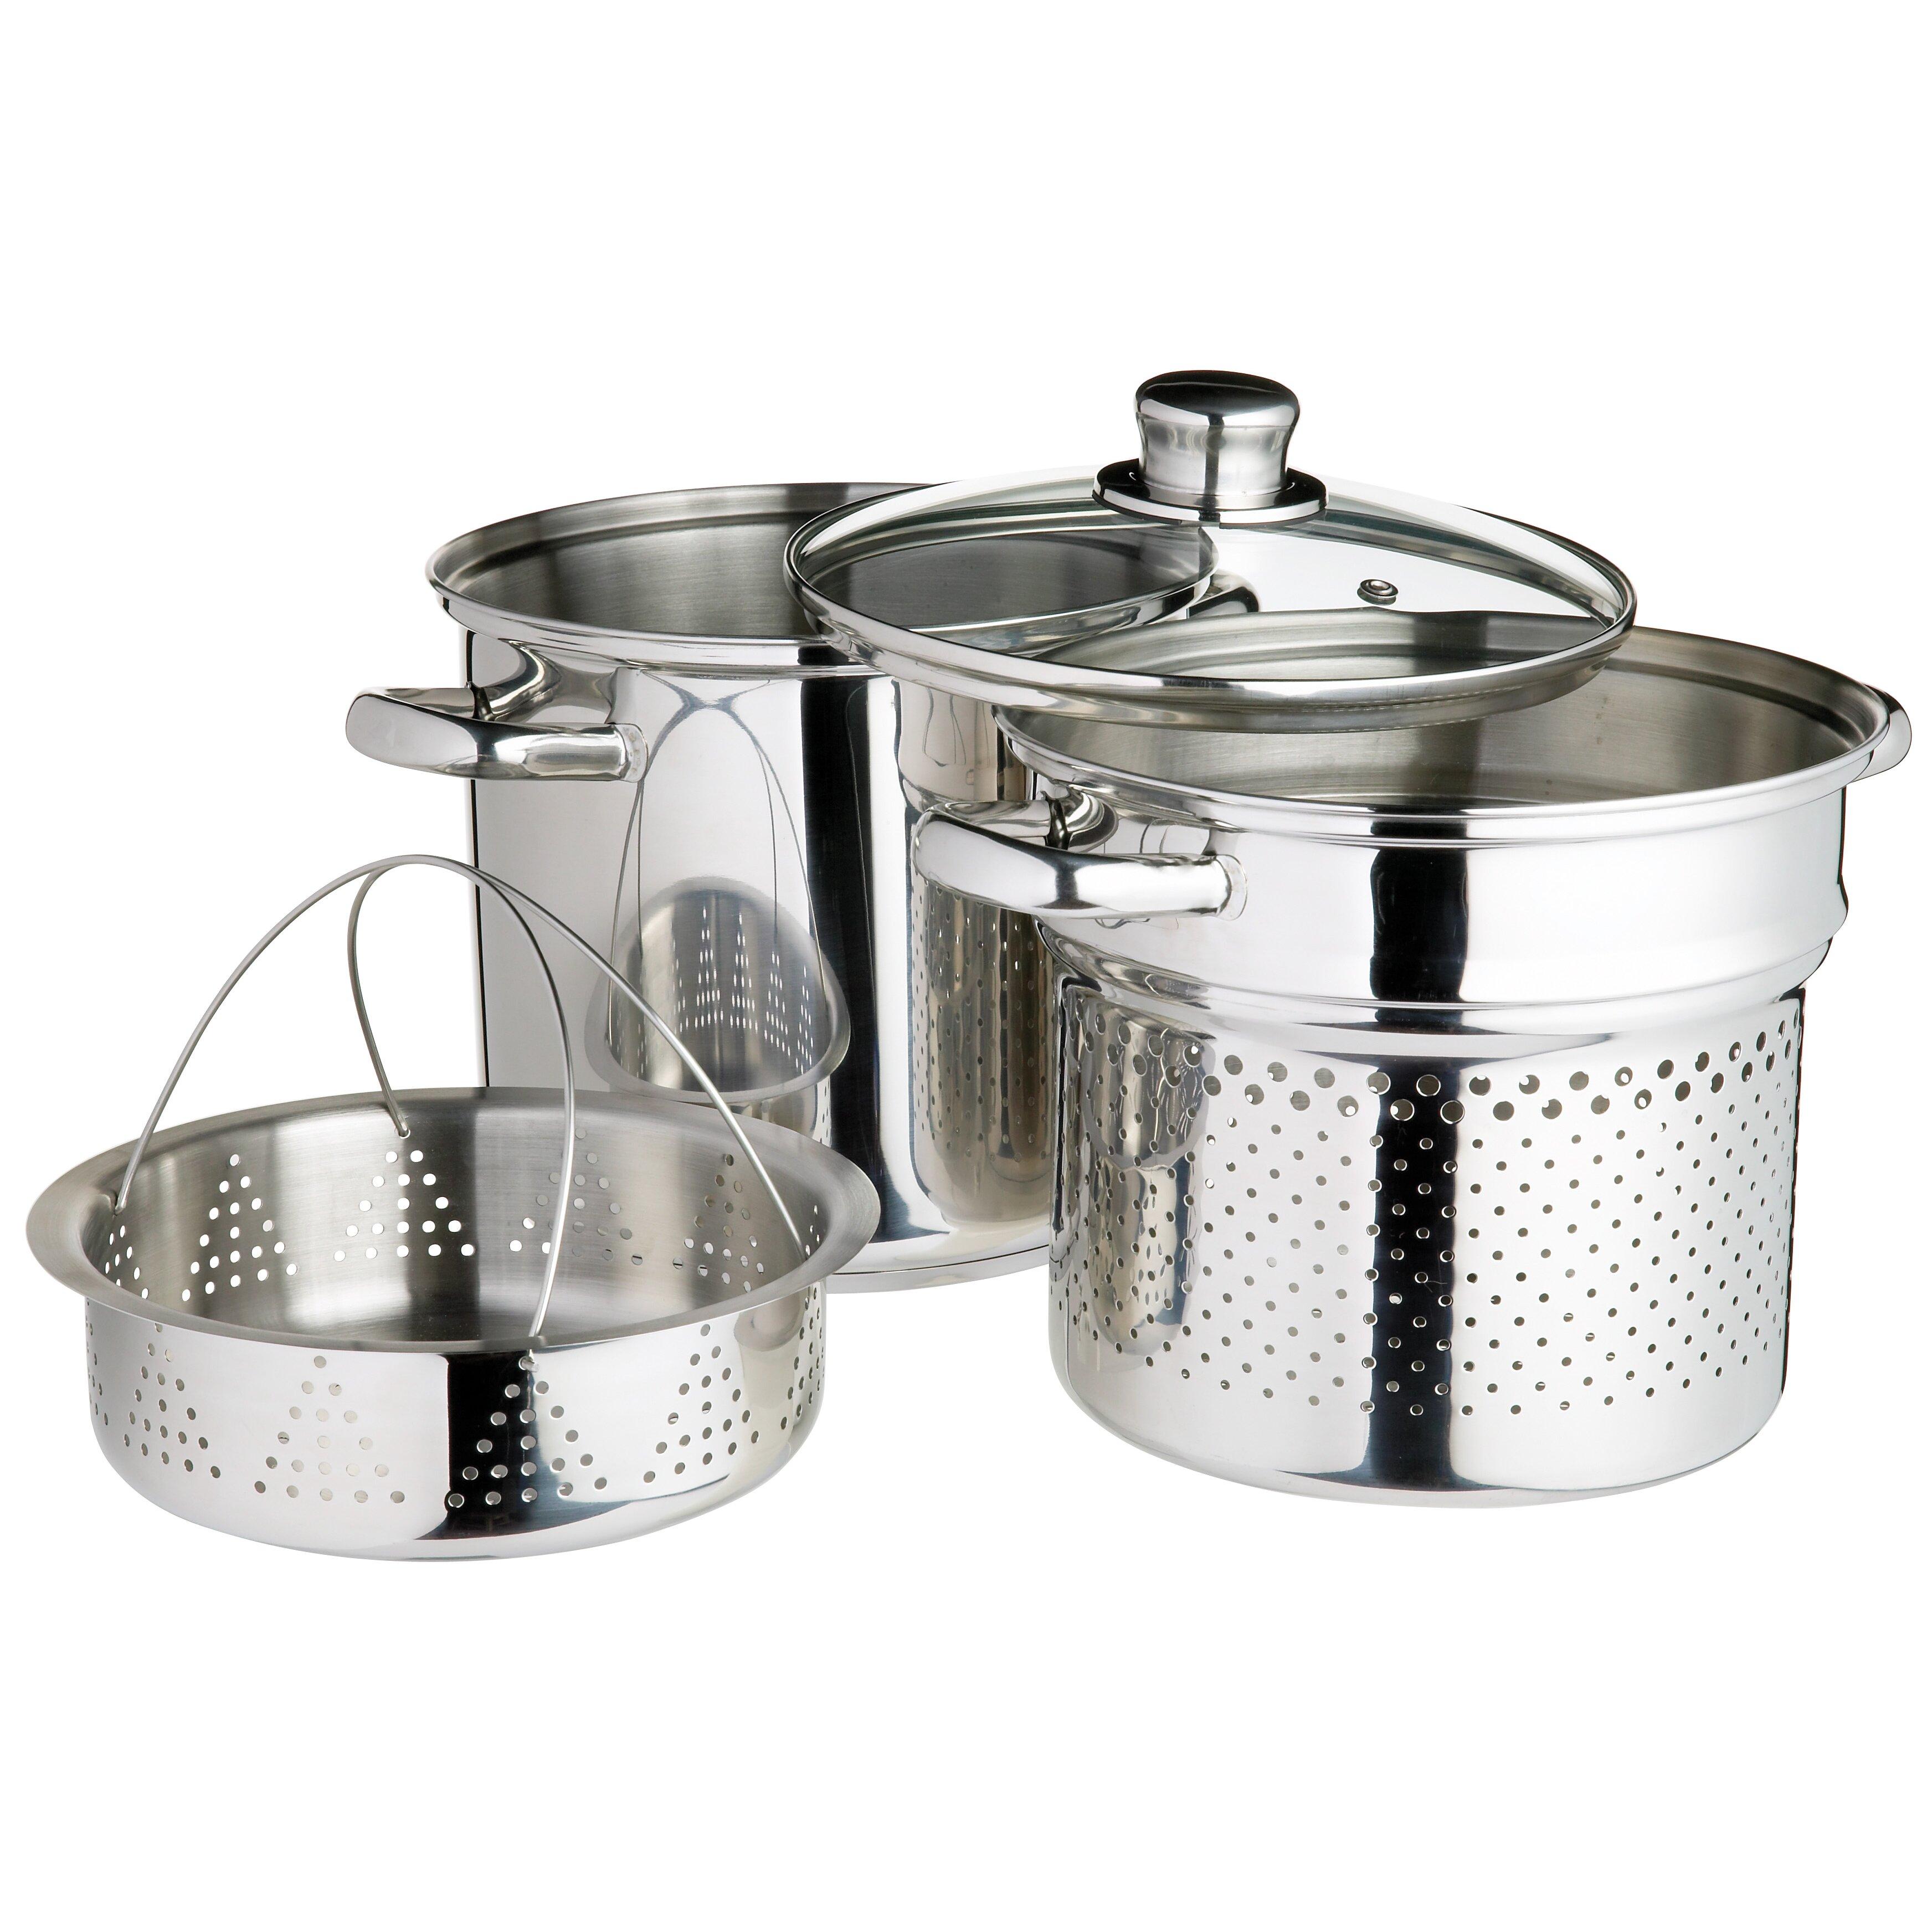 kitchen craft italian 3 piece stainless steel cookware set reviews wayfair uk. Black Bedroom Furniture Sets. Home Design Ideas